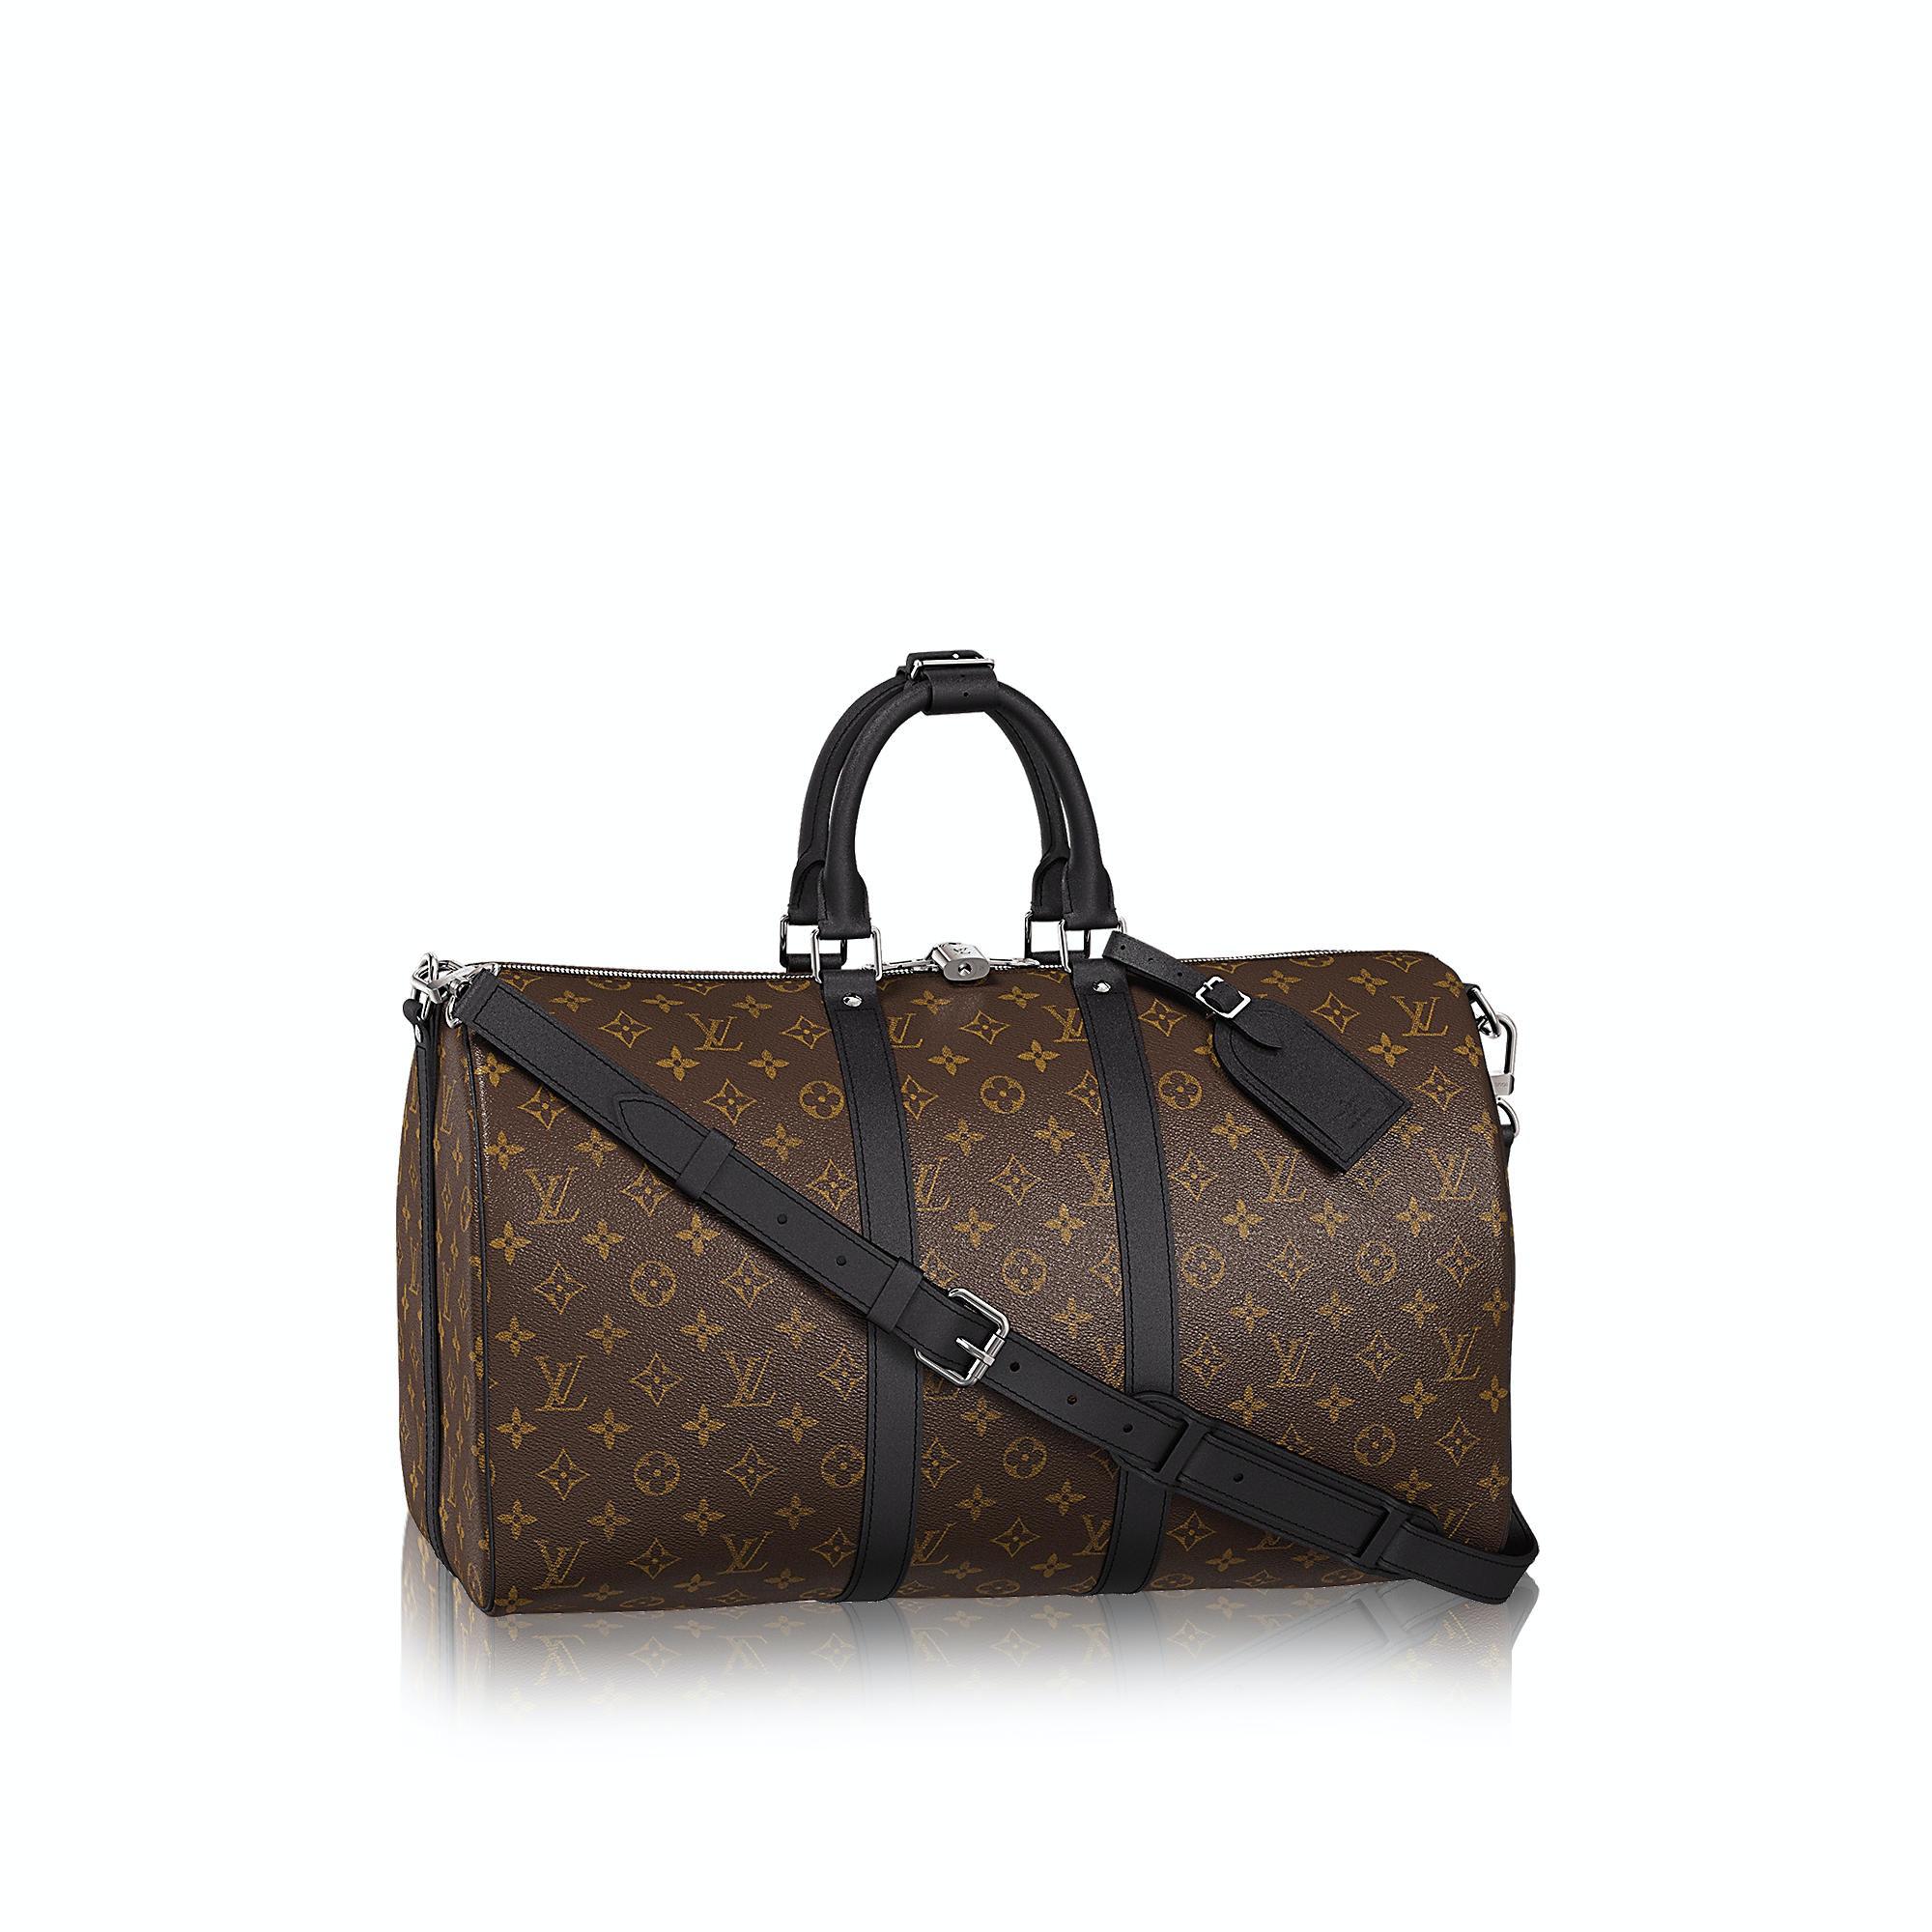 Louis Vuitton Keepall Bandouliere Monogram Macassar 45 Brown/Black